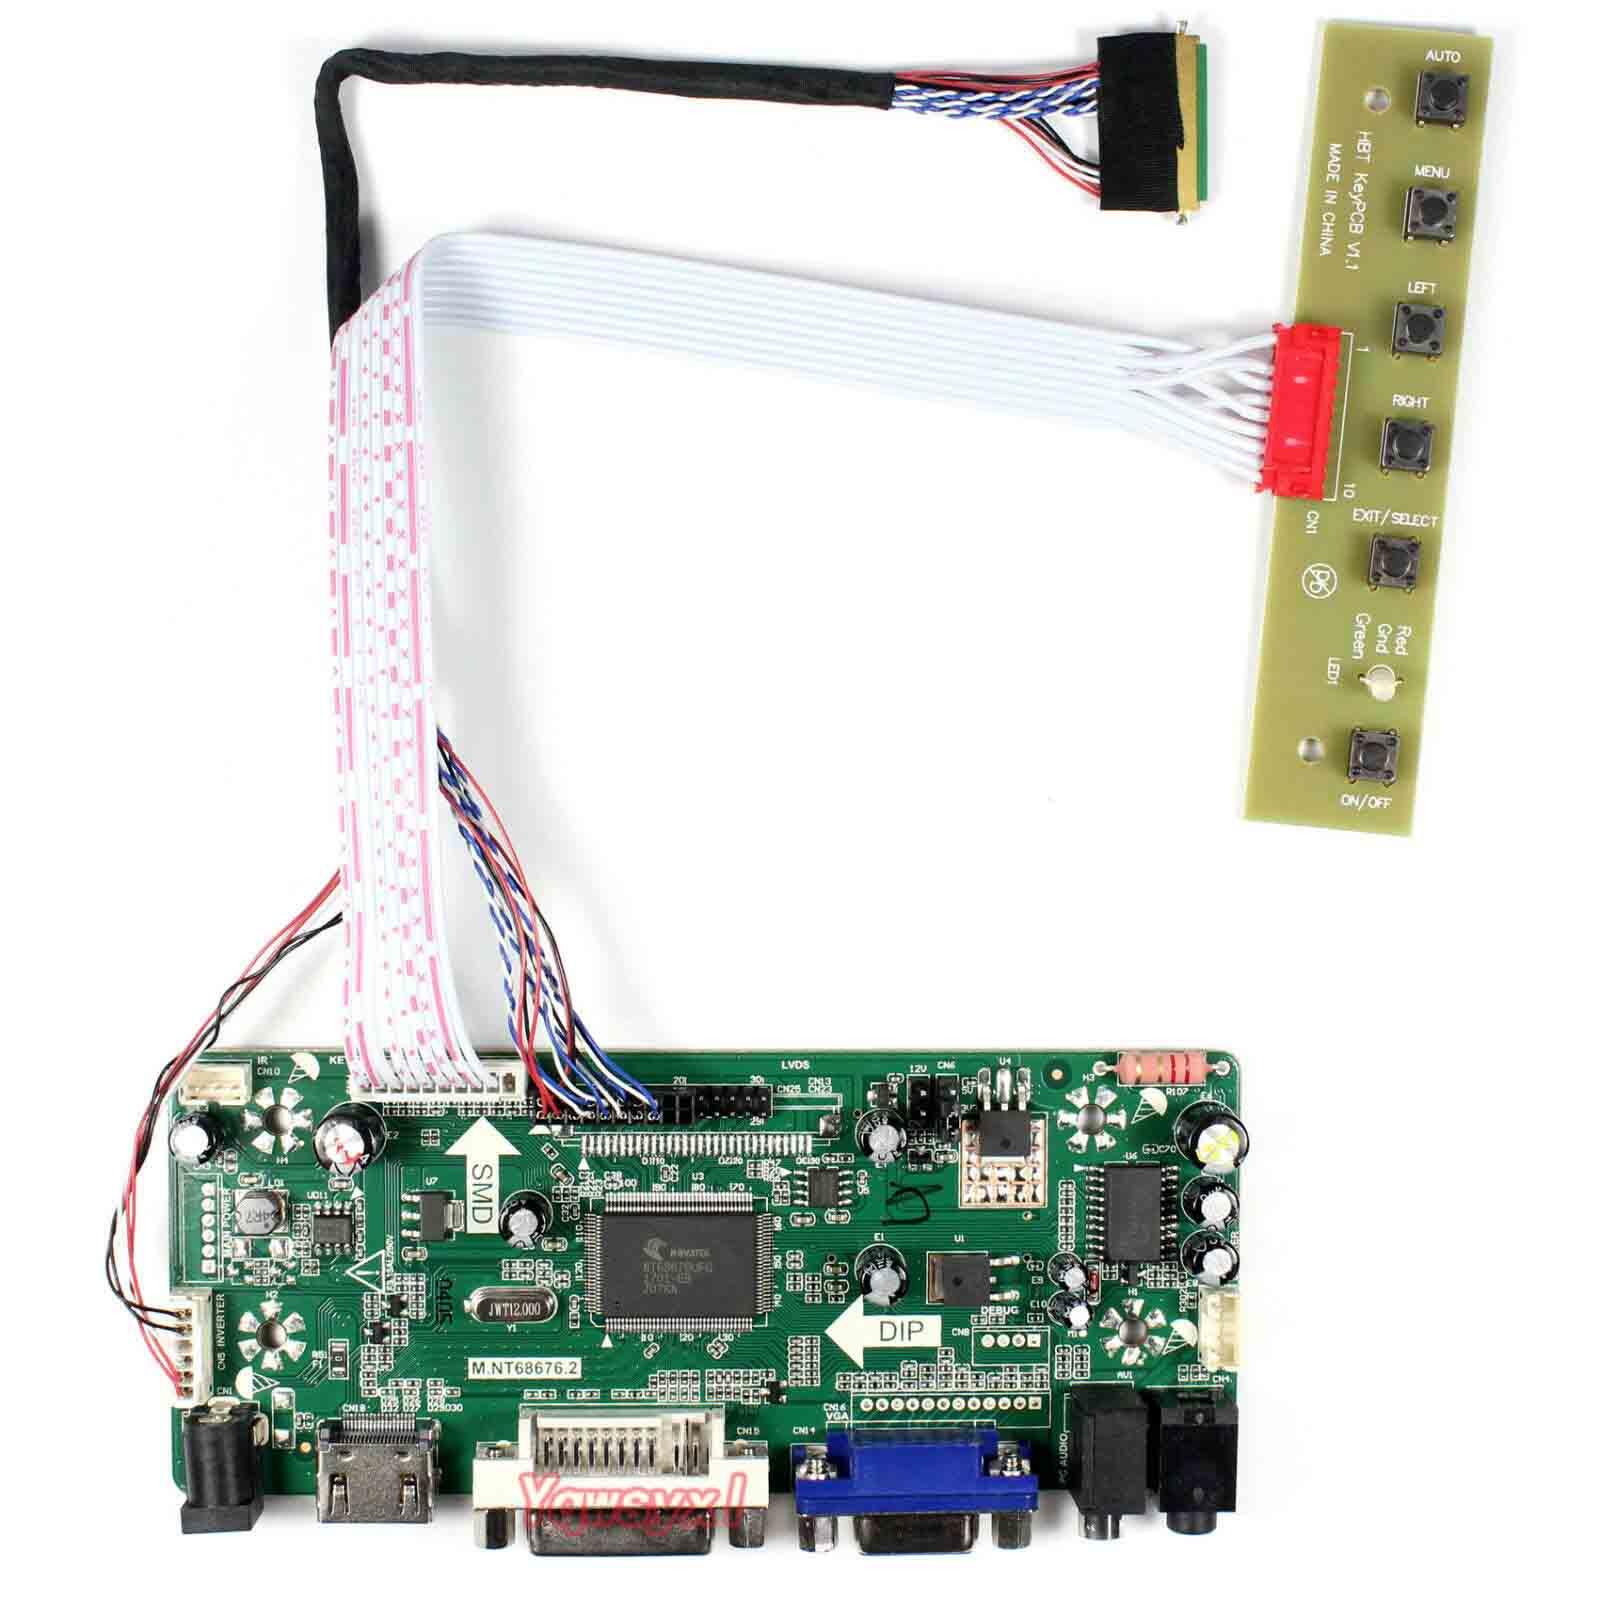 Yqwsyxl Control Board Monitor Kit For HSD100IFW1-A00 HDMI+DVI+VGA LCD LED Screen Controller Board Driver